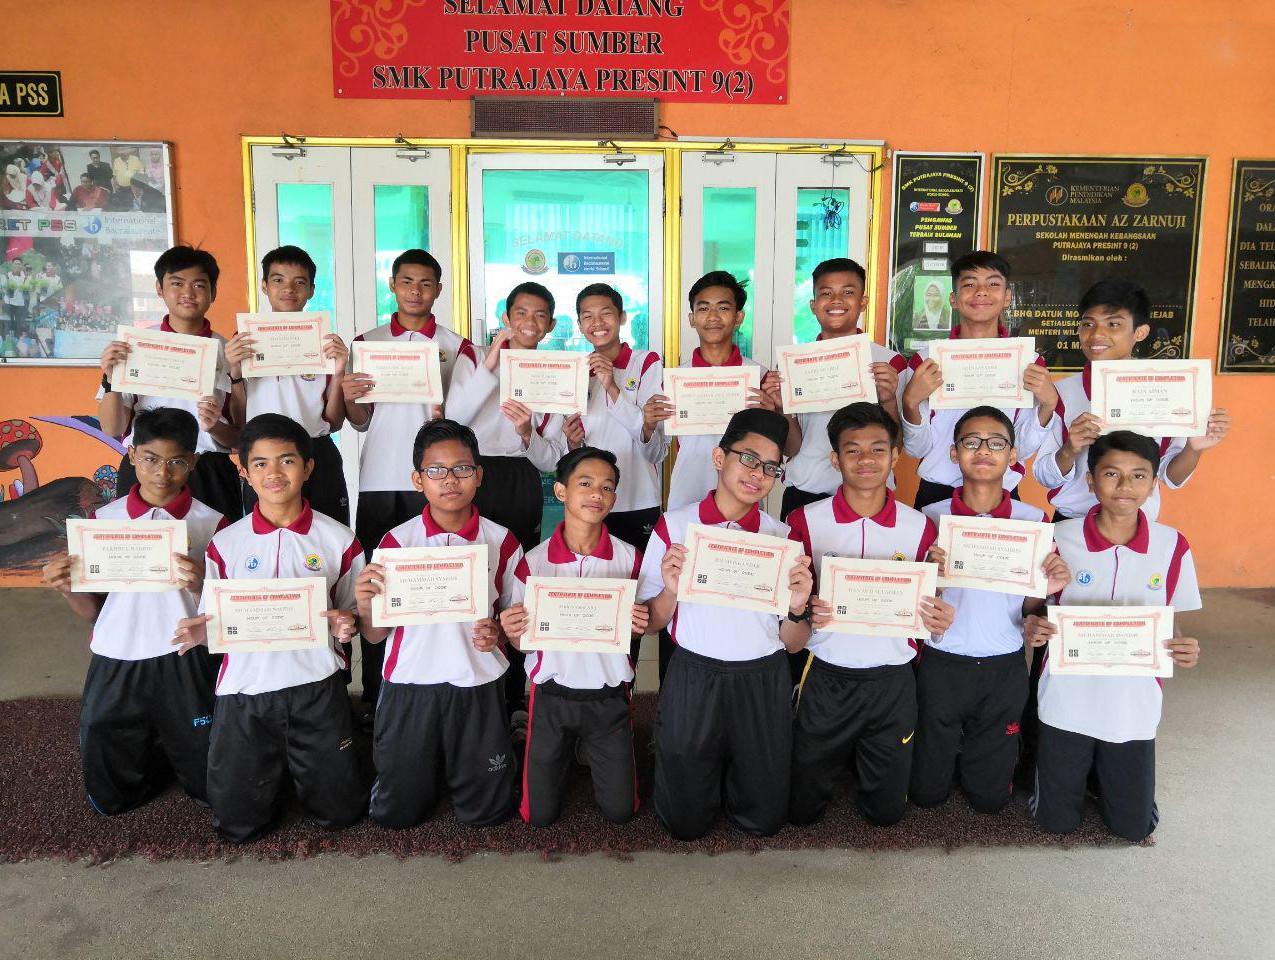 SMK Putrajaya Presint  9(2)